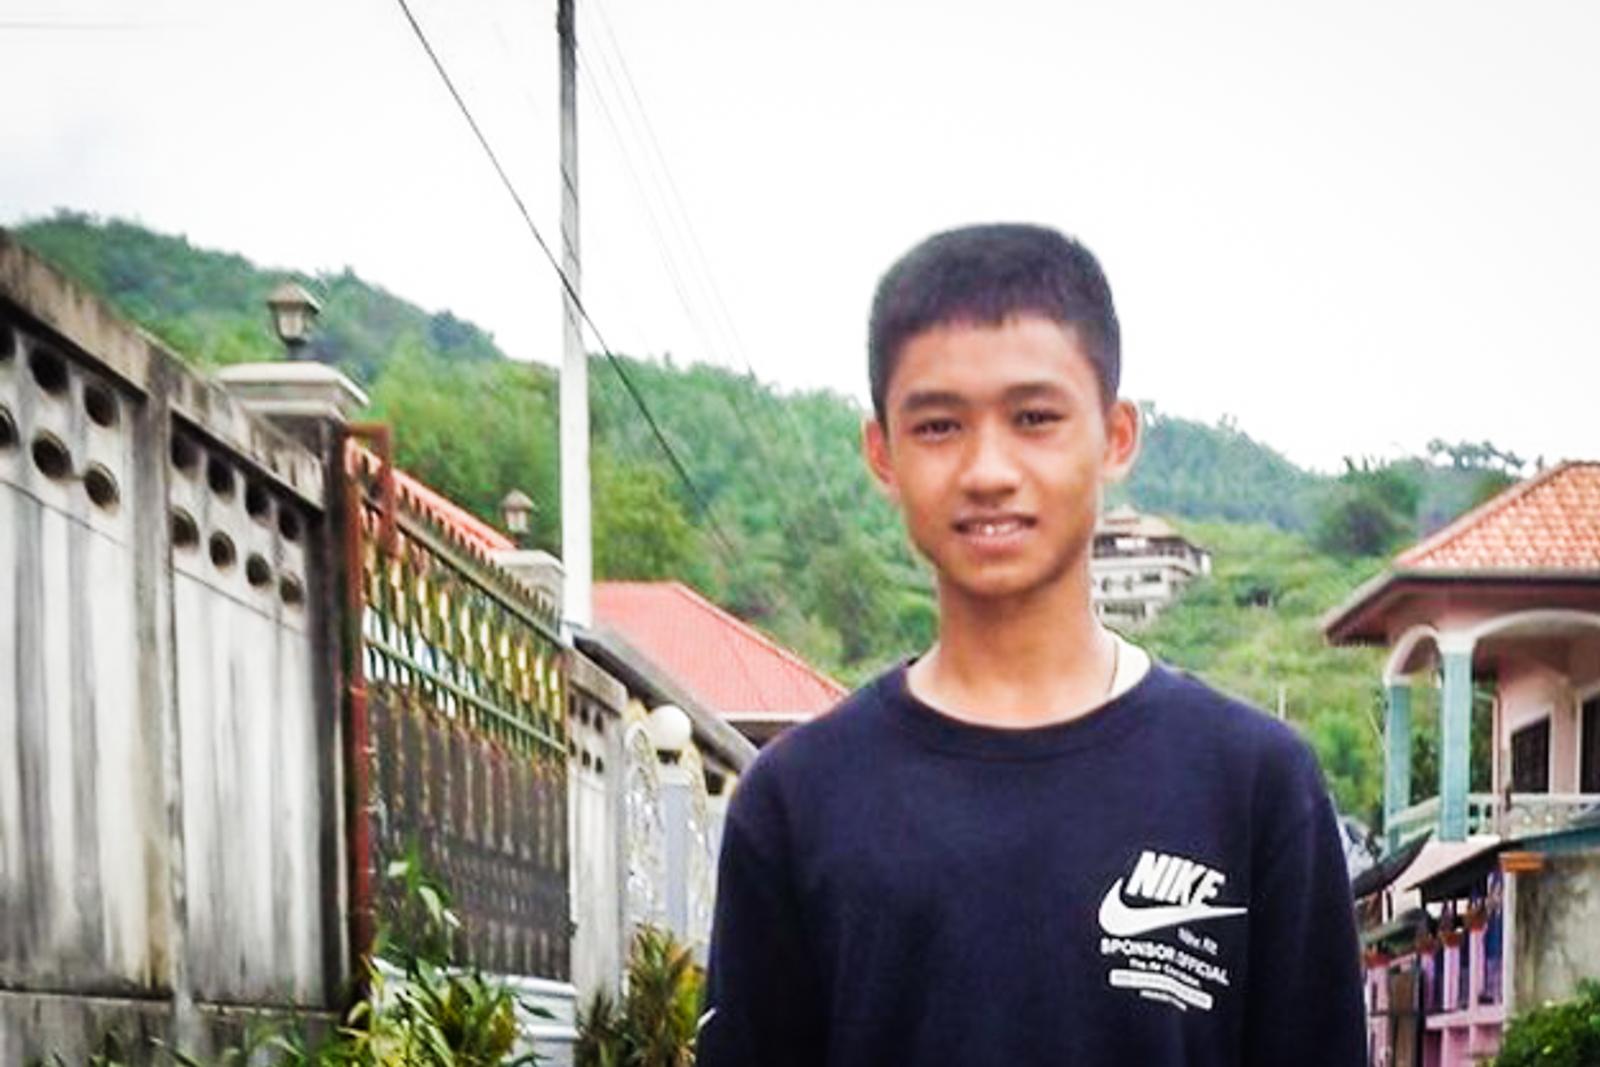 ADUN THAILANDIA GROTTA